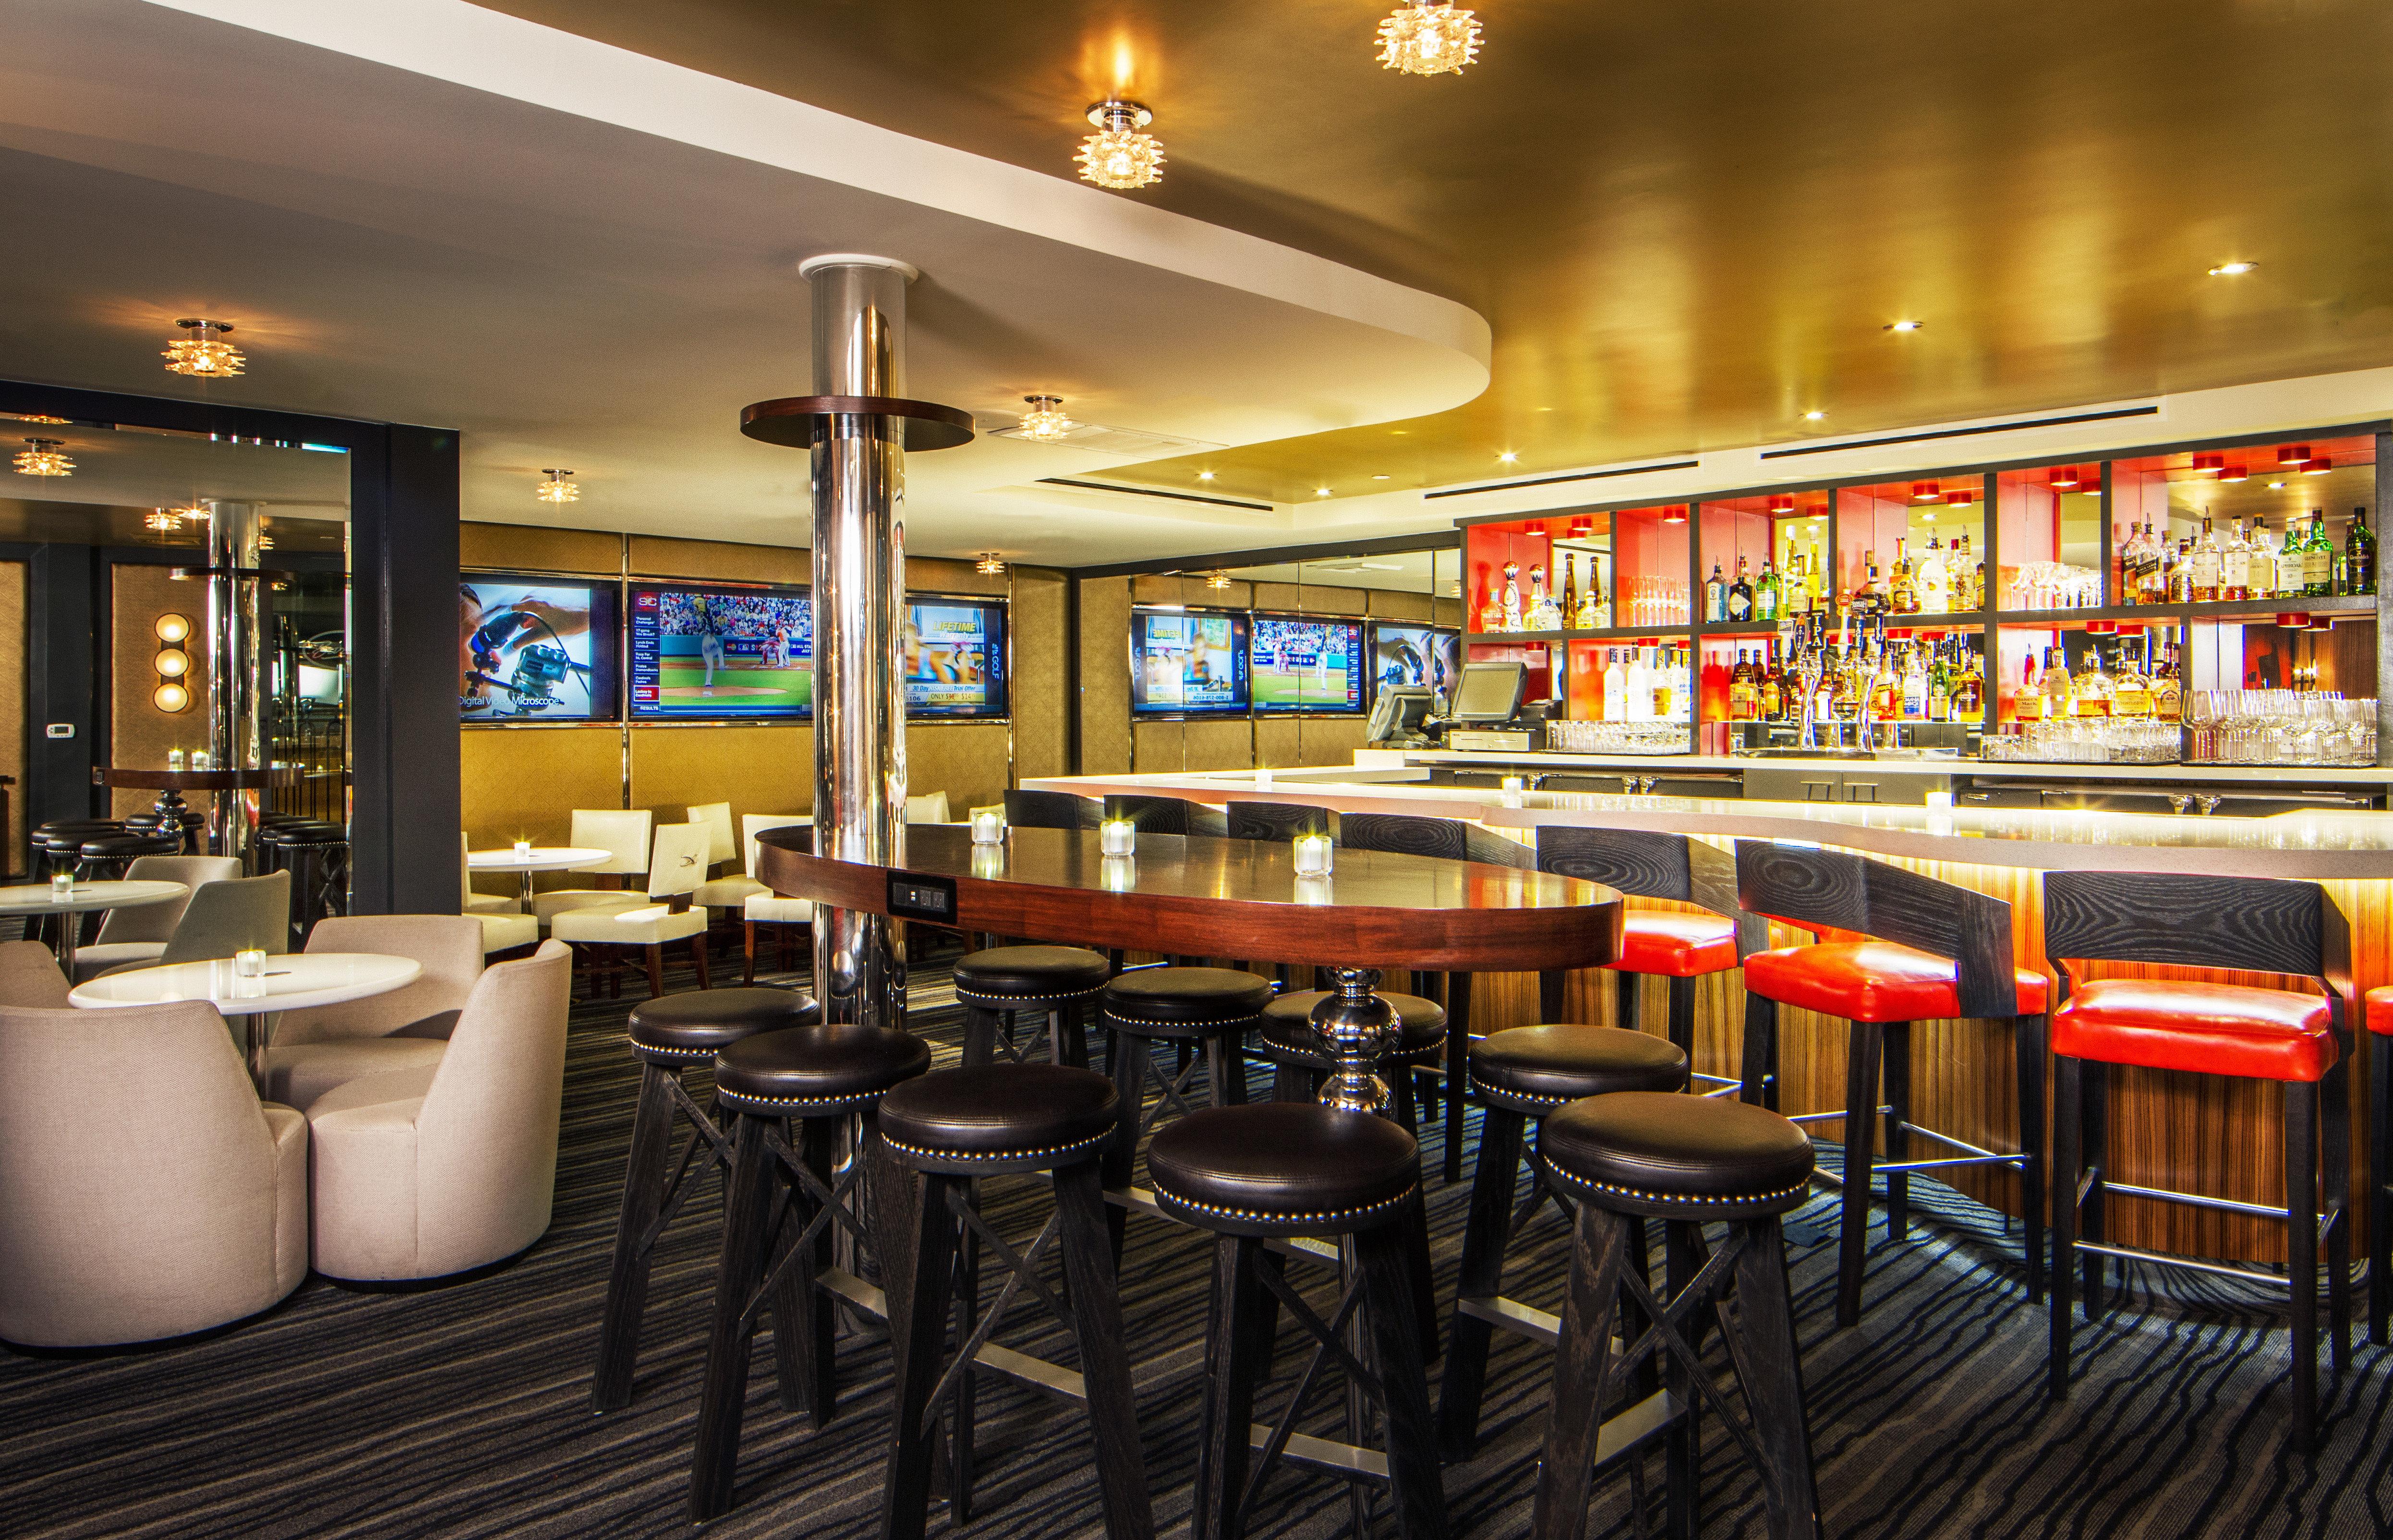 Drink Hip Lounge Party restaurant Bar café function hall